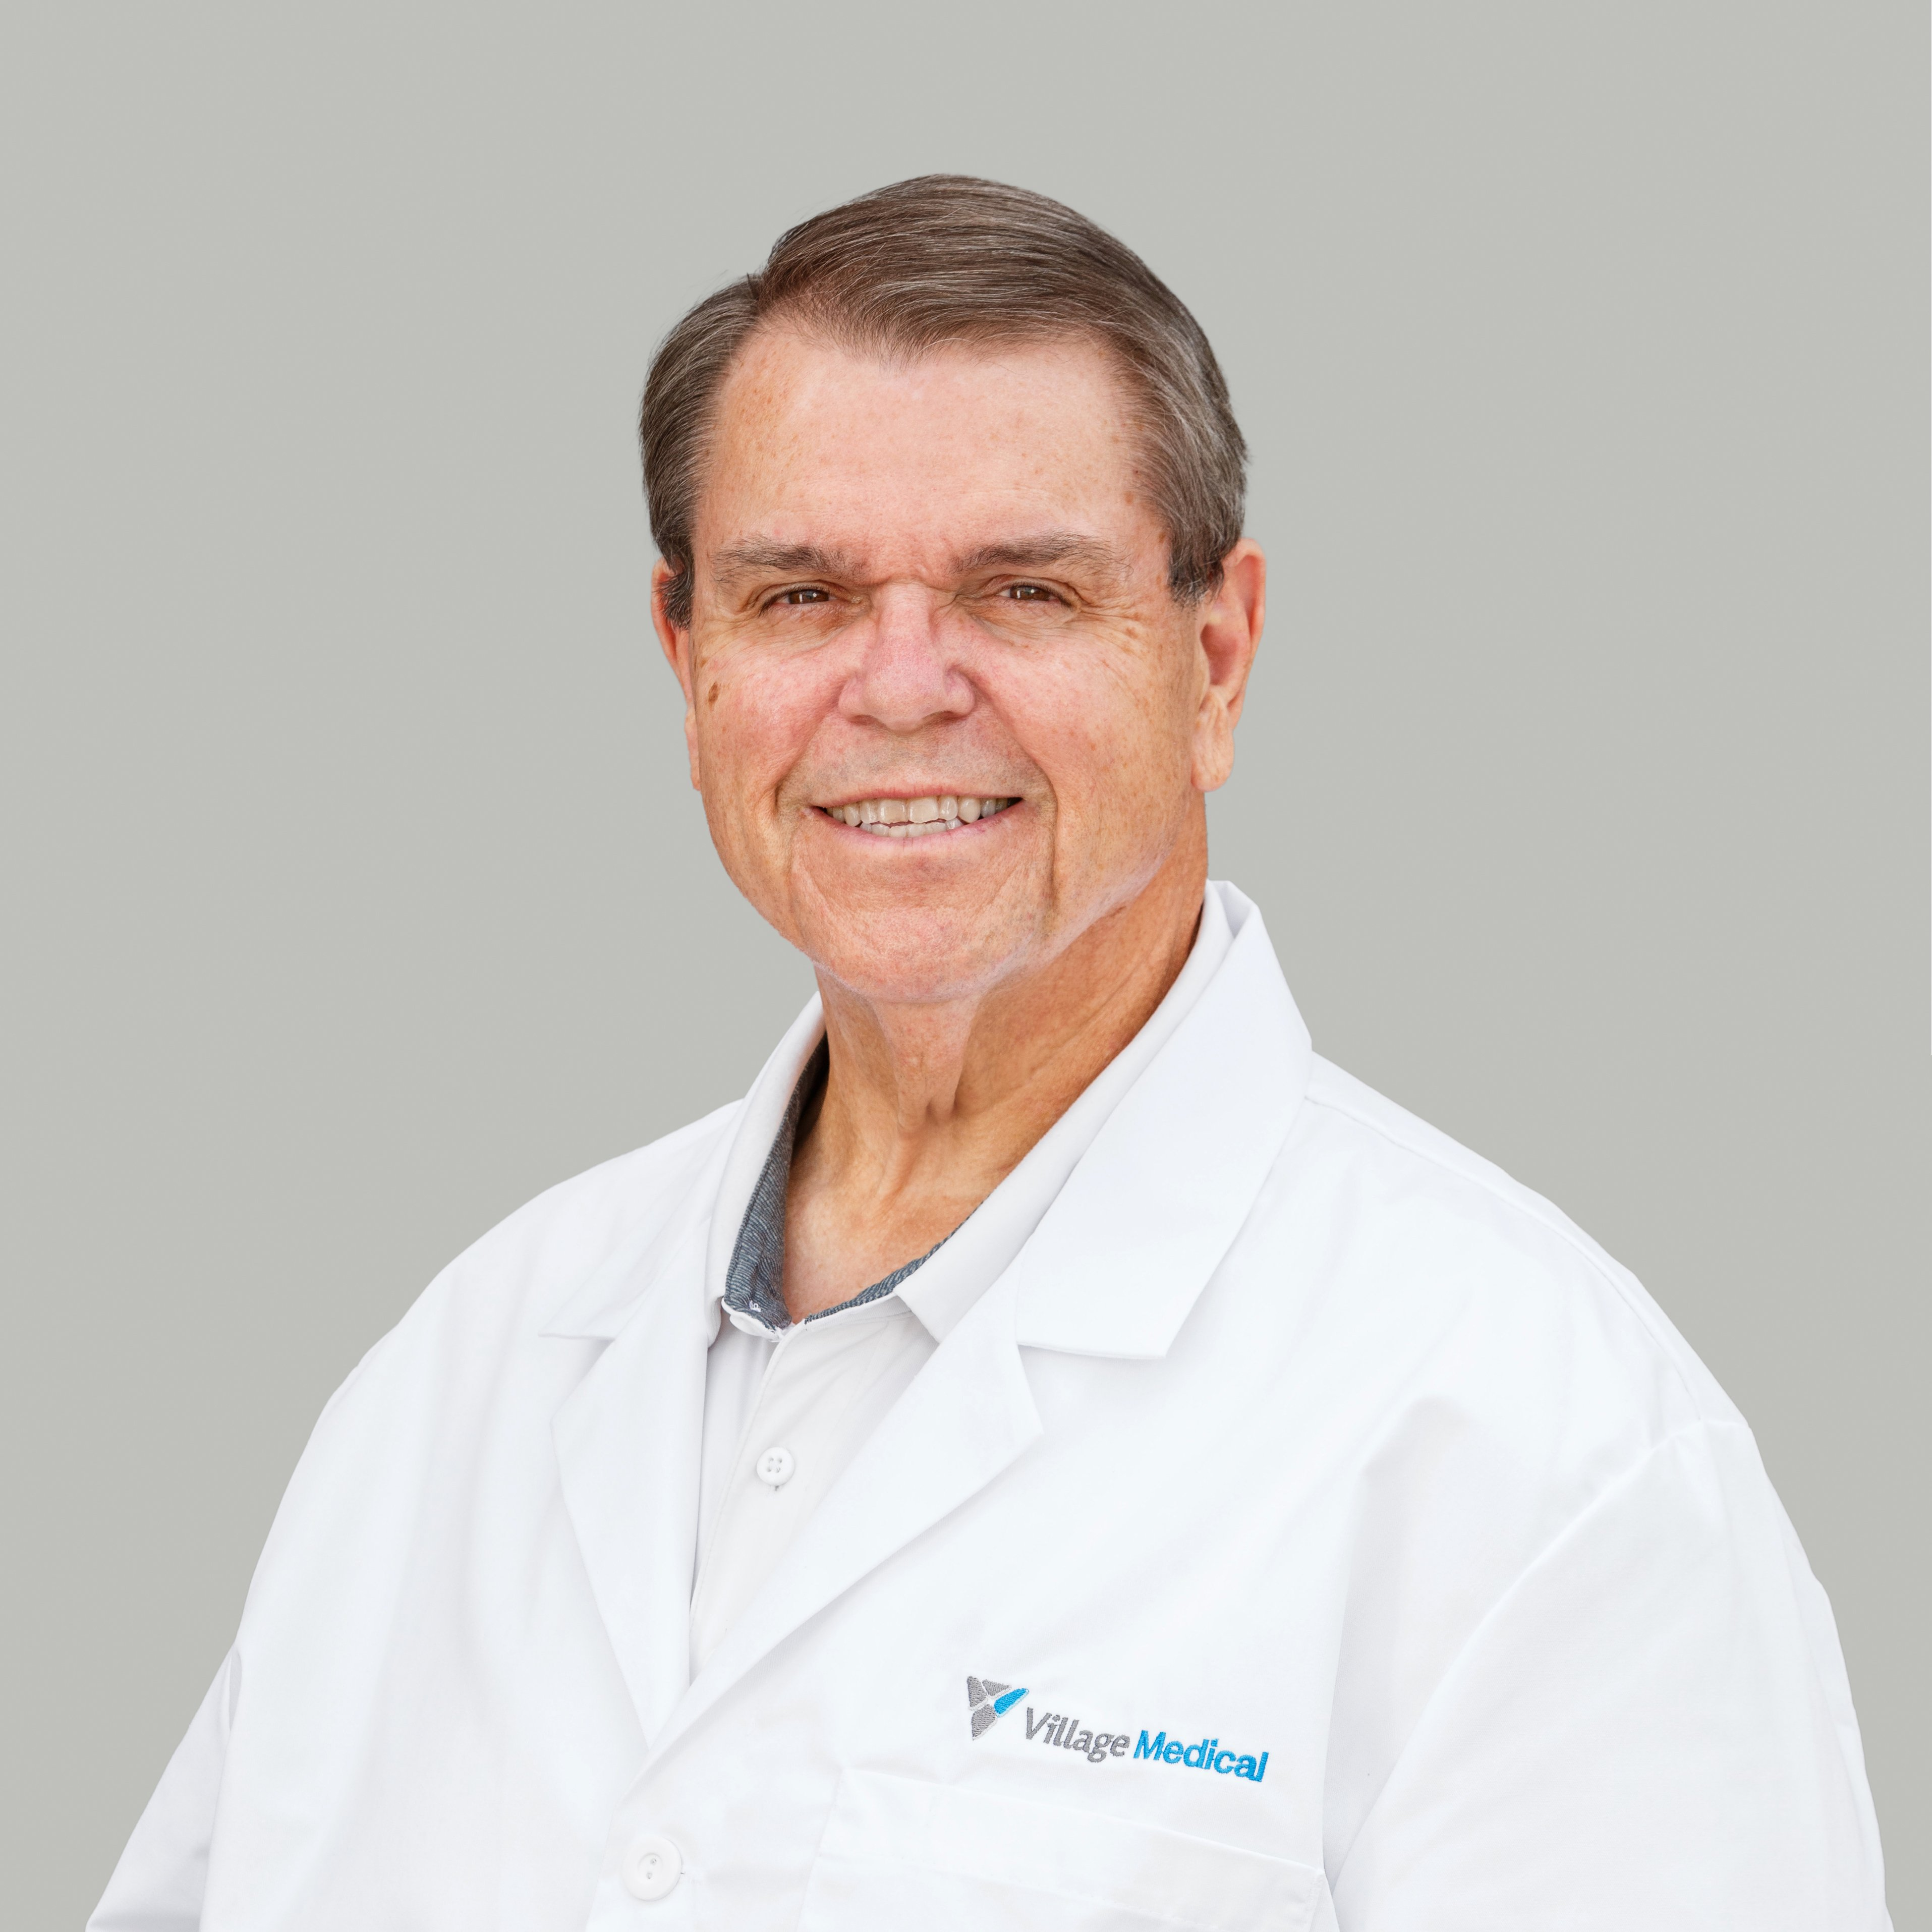 Richard Blalock, MD